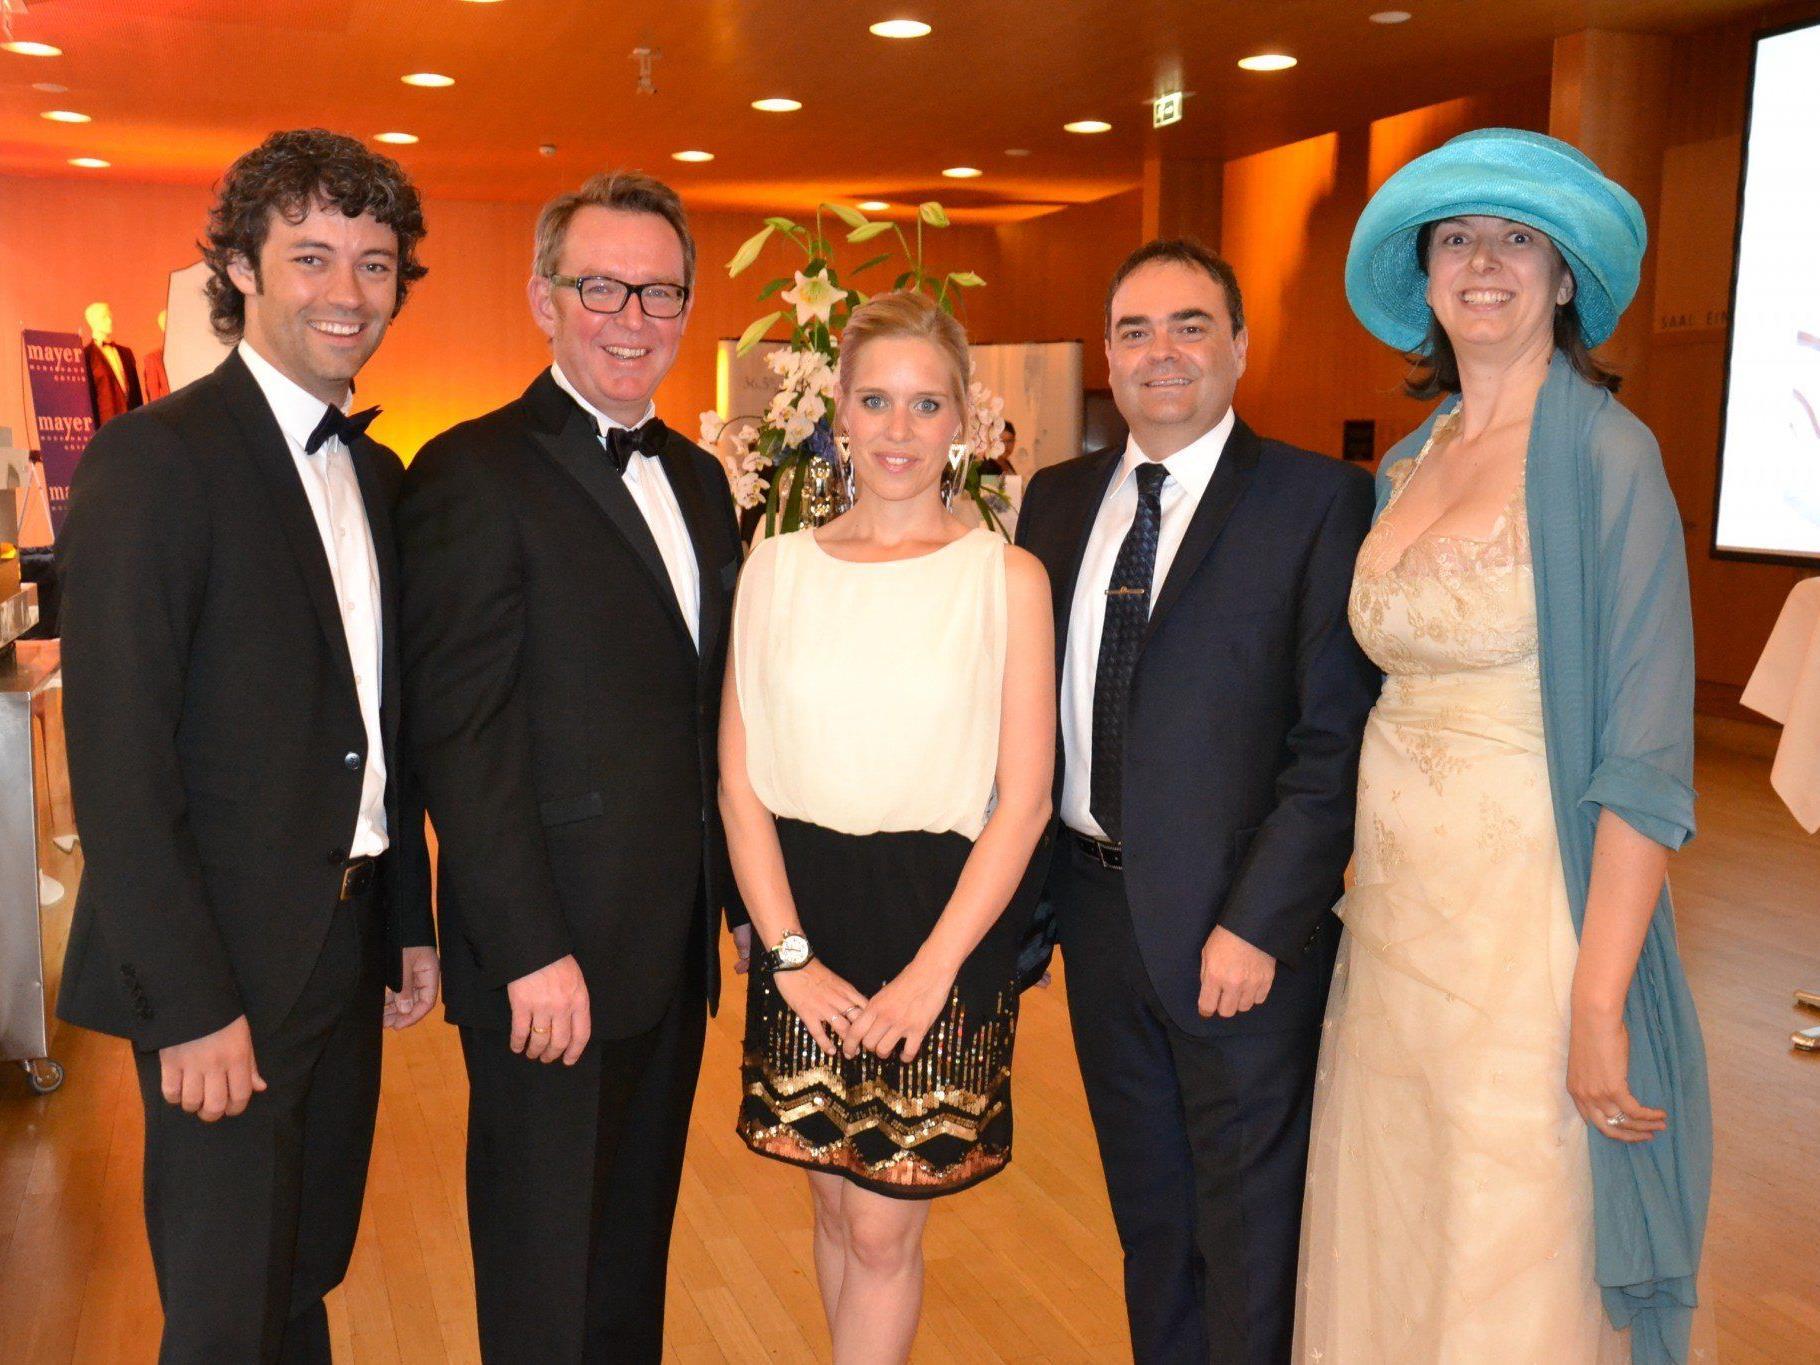 v.l. Martin Frontull, Nikolaus Netzer, Janine Bereuter, Thomas Mitterlechner und Präsidentin Margit Hinterholzer